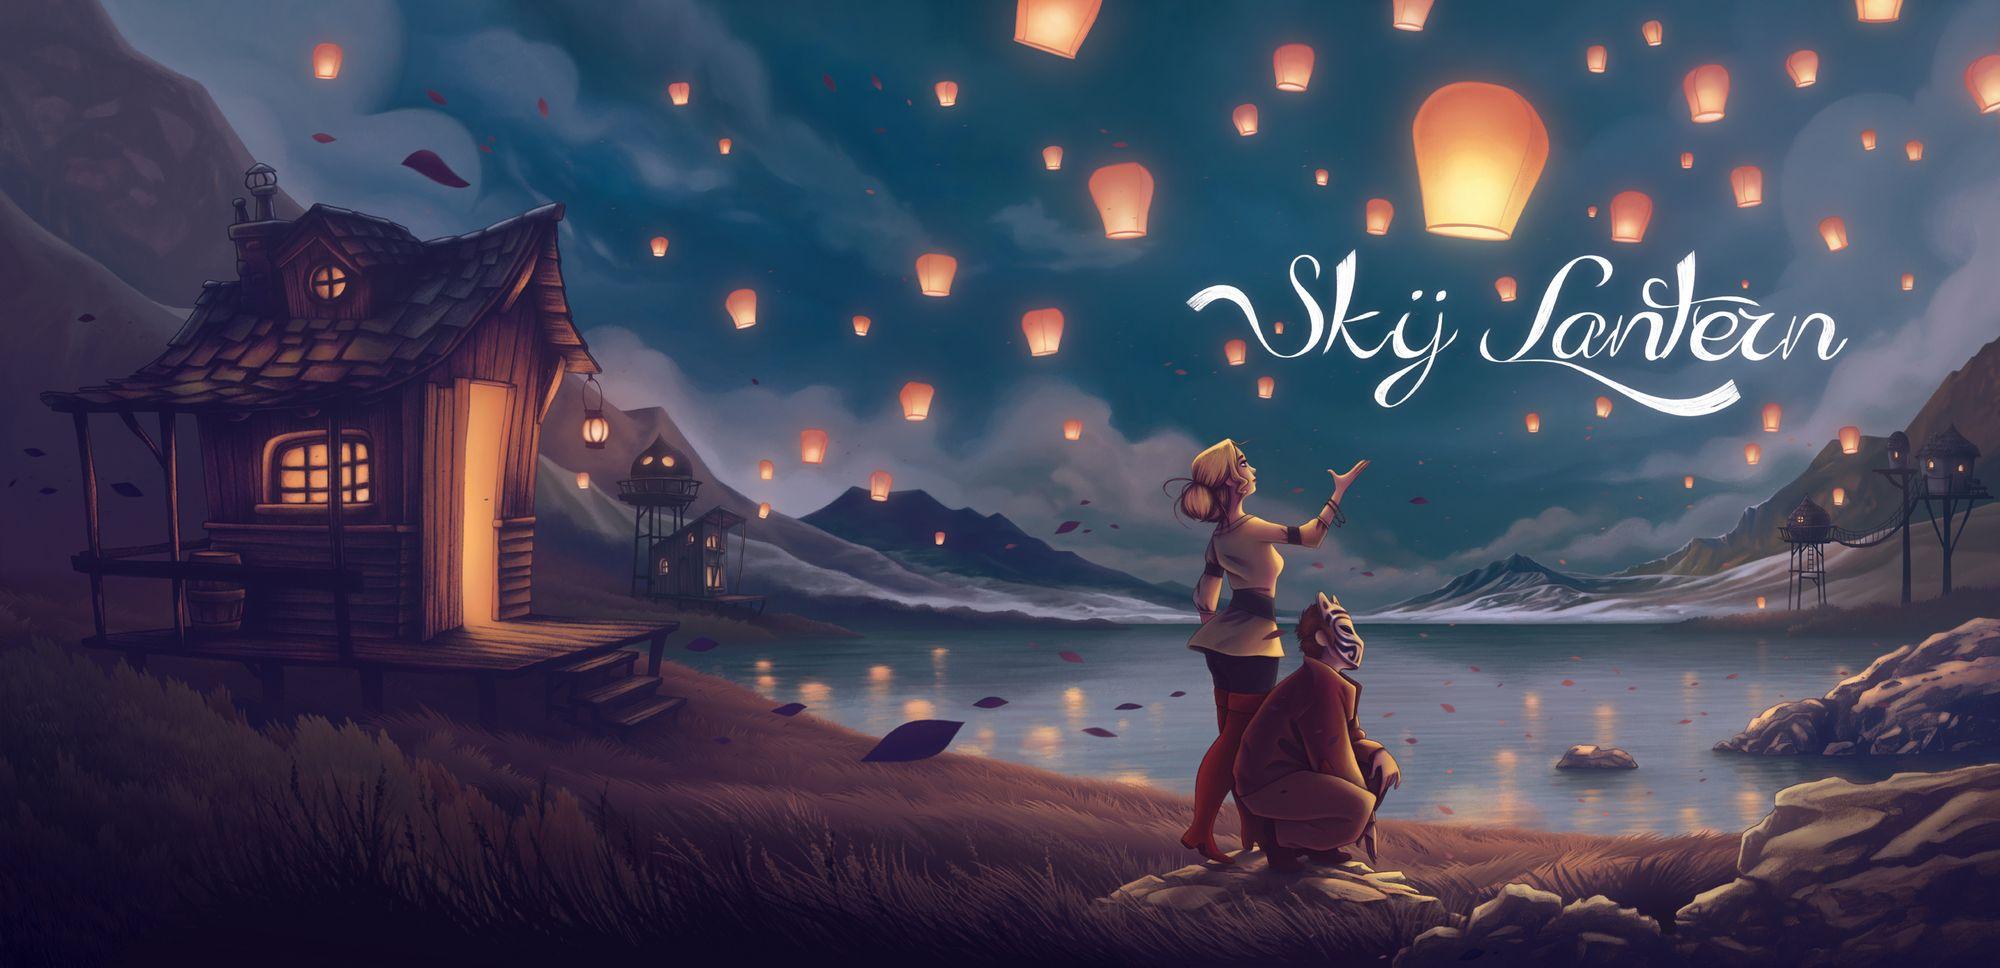 Discover Skylantern